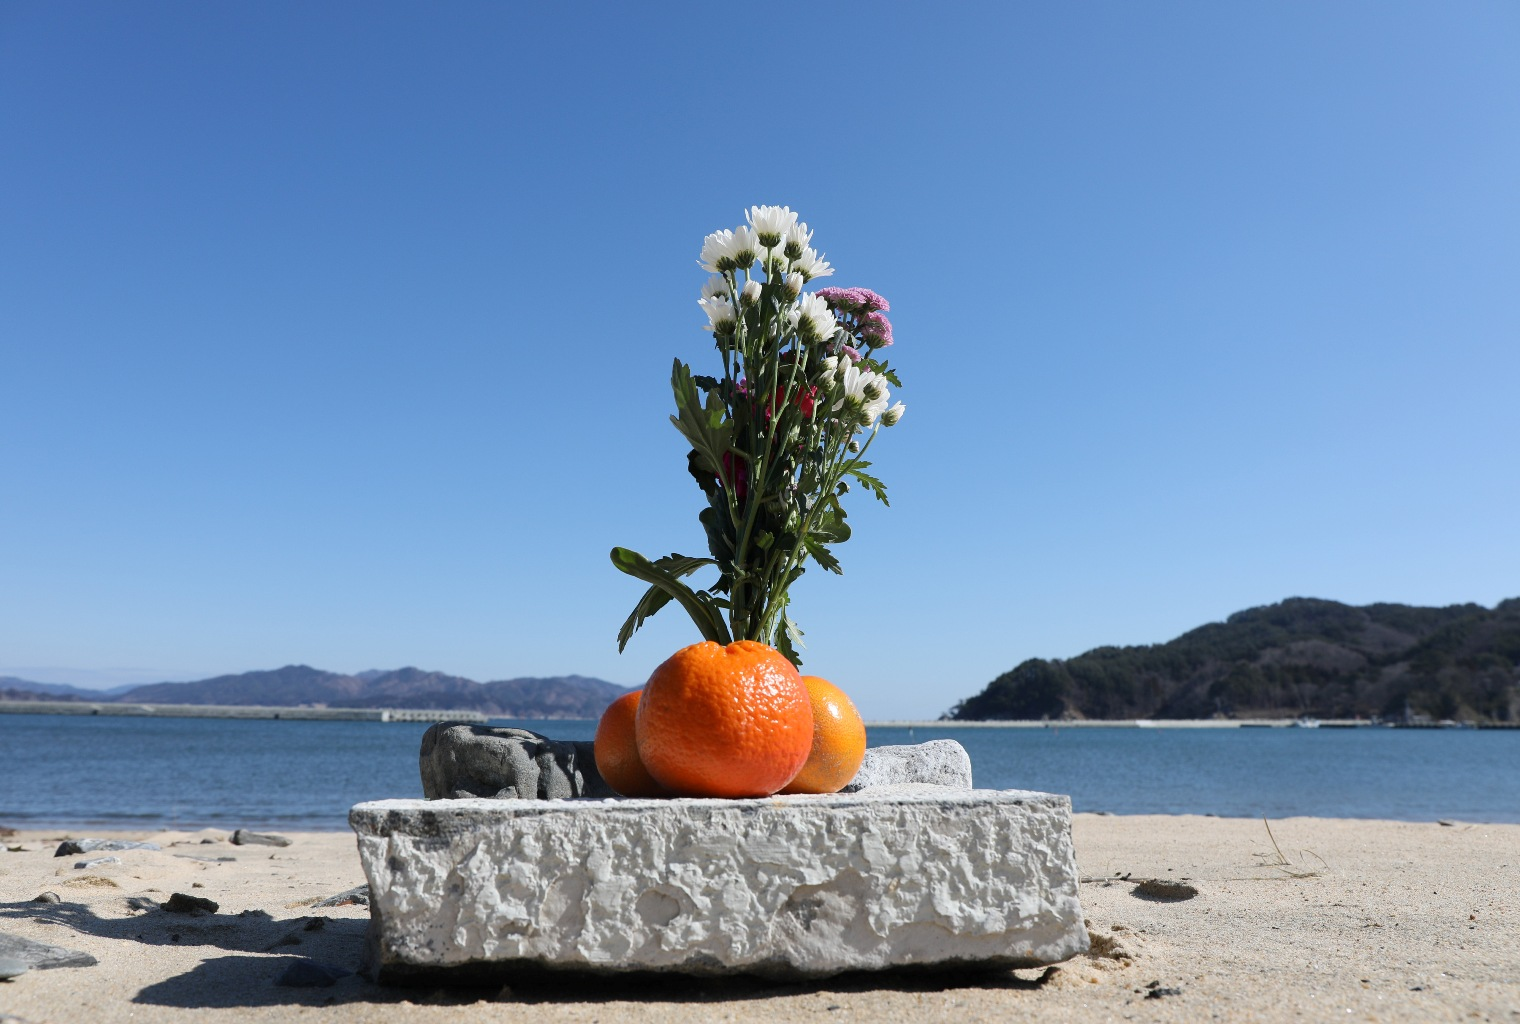 Flower and oranges at the Yoshiuri coast